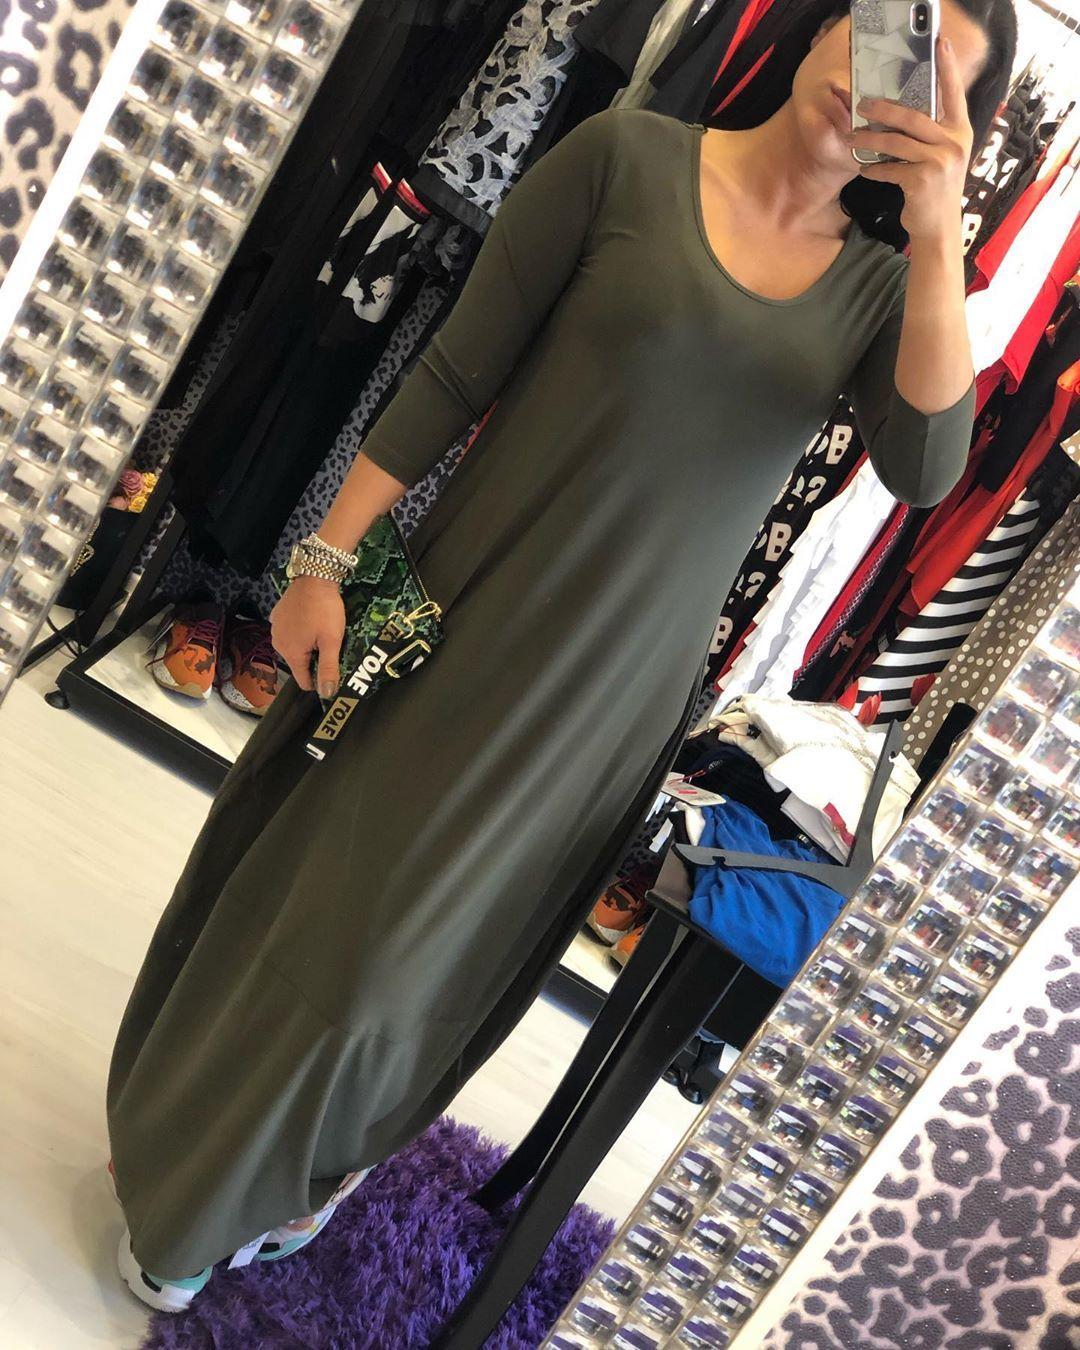 Whosale Toptan Toptan Toptangiyim Bayan Bayangiyim Alisveris Merter Mertertoptan Gungorentoptan Shoppingonline Indirim Elbise Moda Elbise Moda Sal